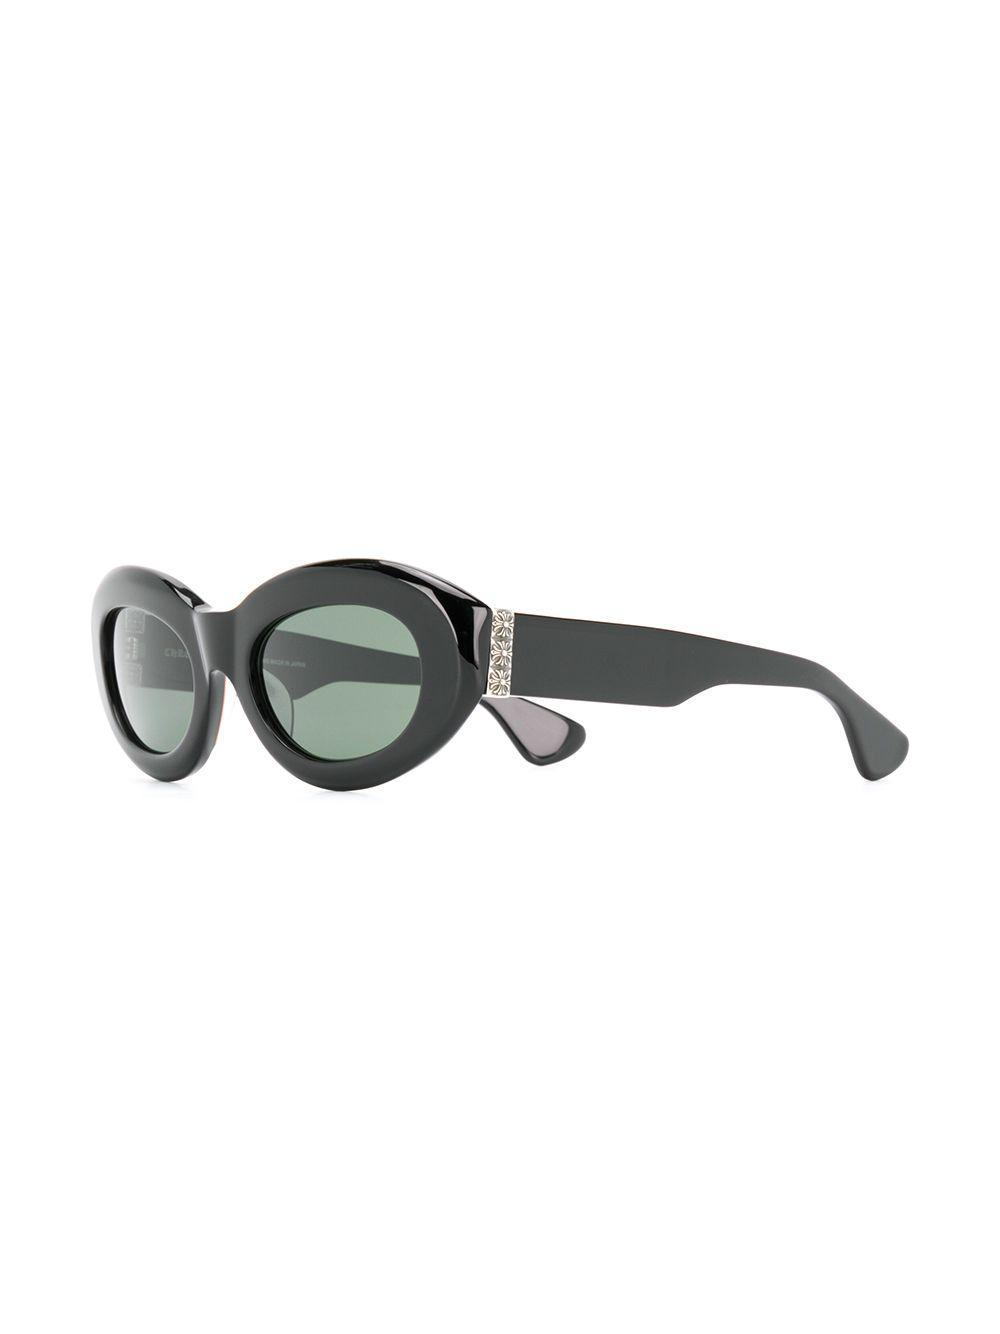 551db9b3fc6 Chrome Hearts - Black Cat Eye Sunglasses - Lyst. View fullscreen